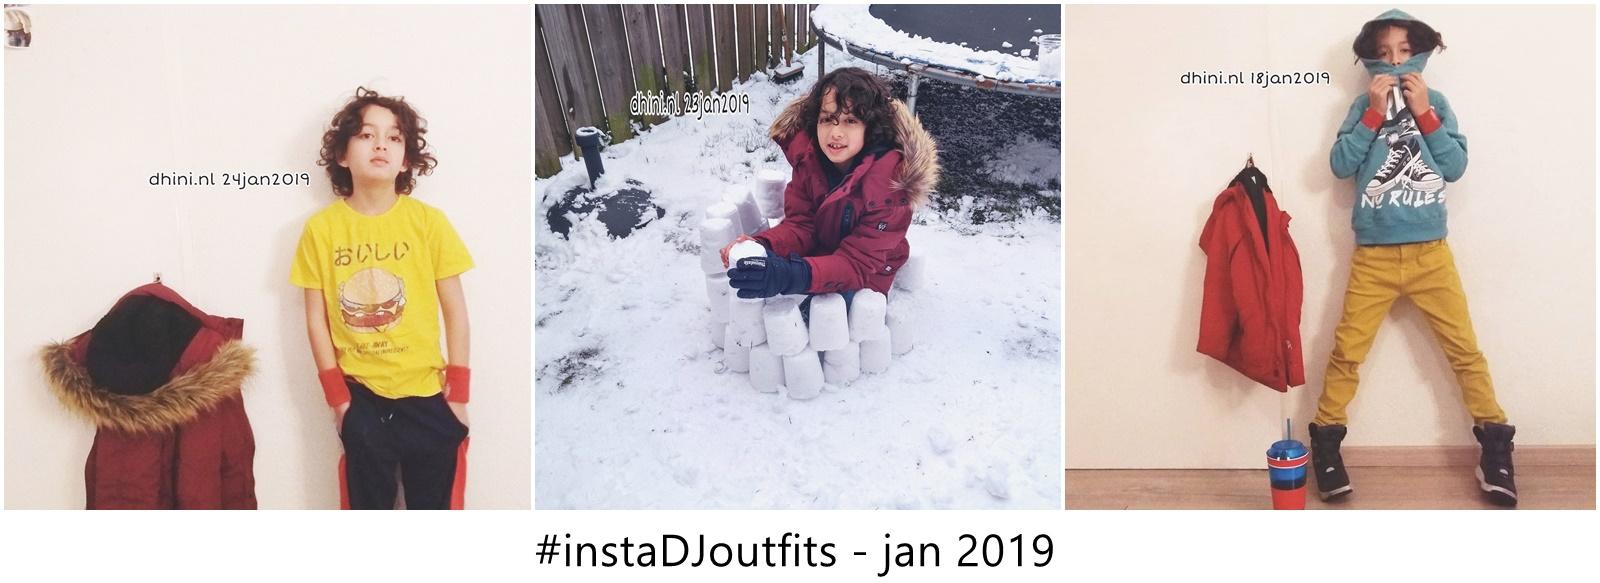 2019insta-DJoutfits1